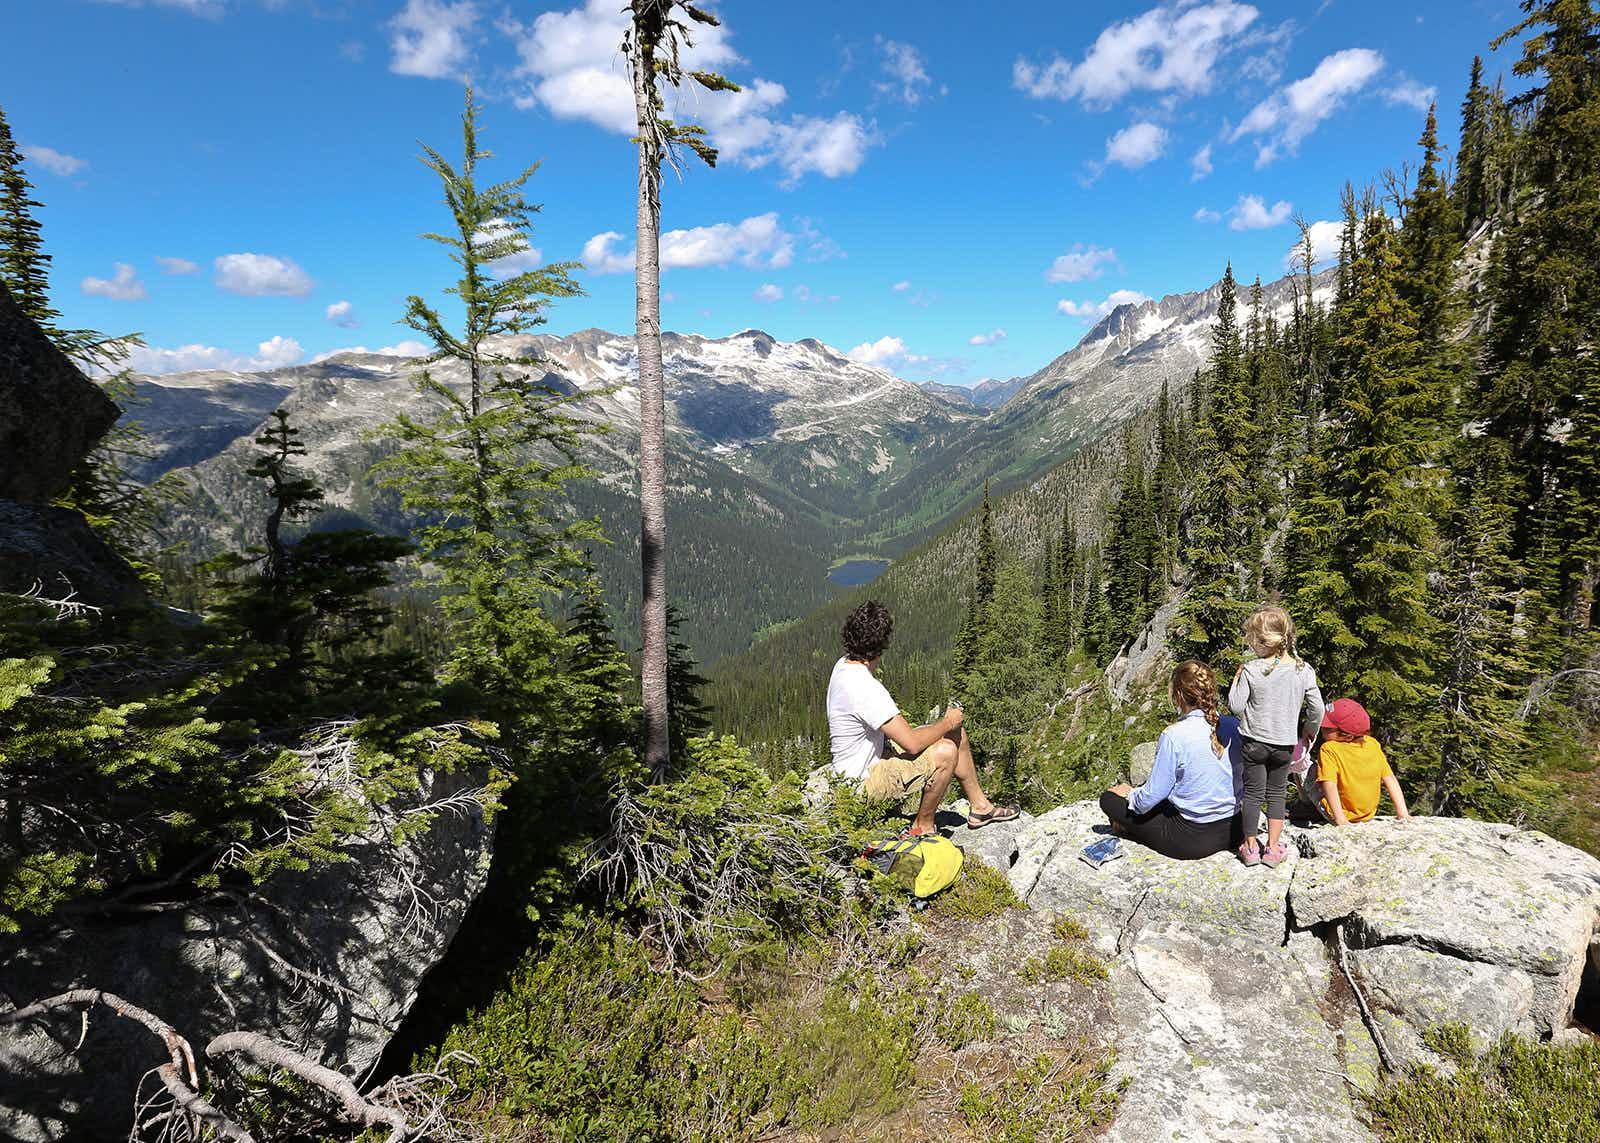 Meet a traveller: Canadian Prime Minister Justin Trudeau